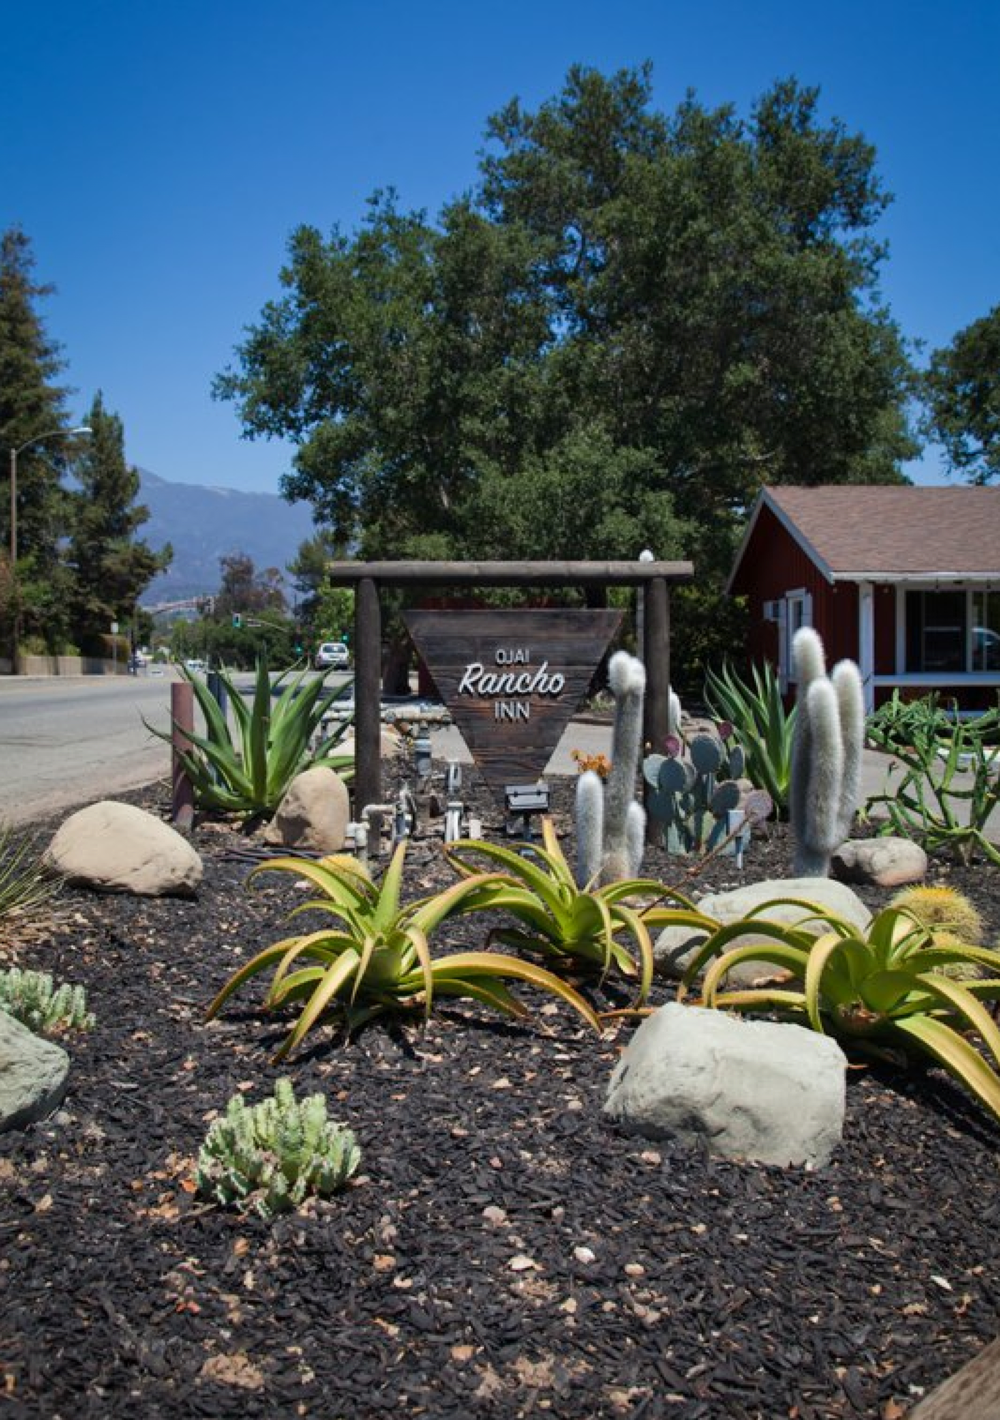 the ojai rancho inn. photo: apartment therapy